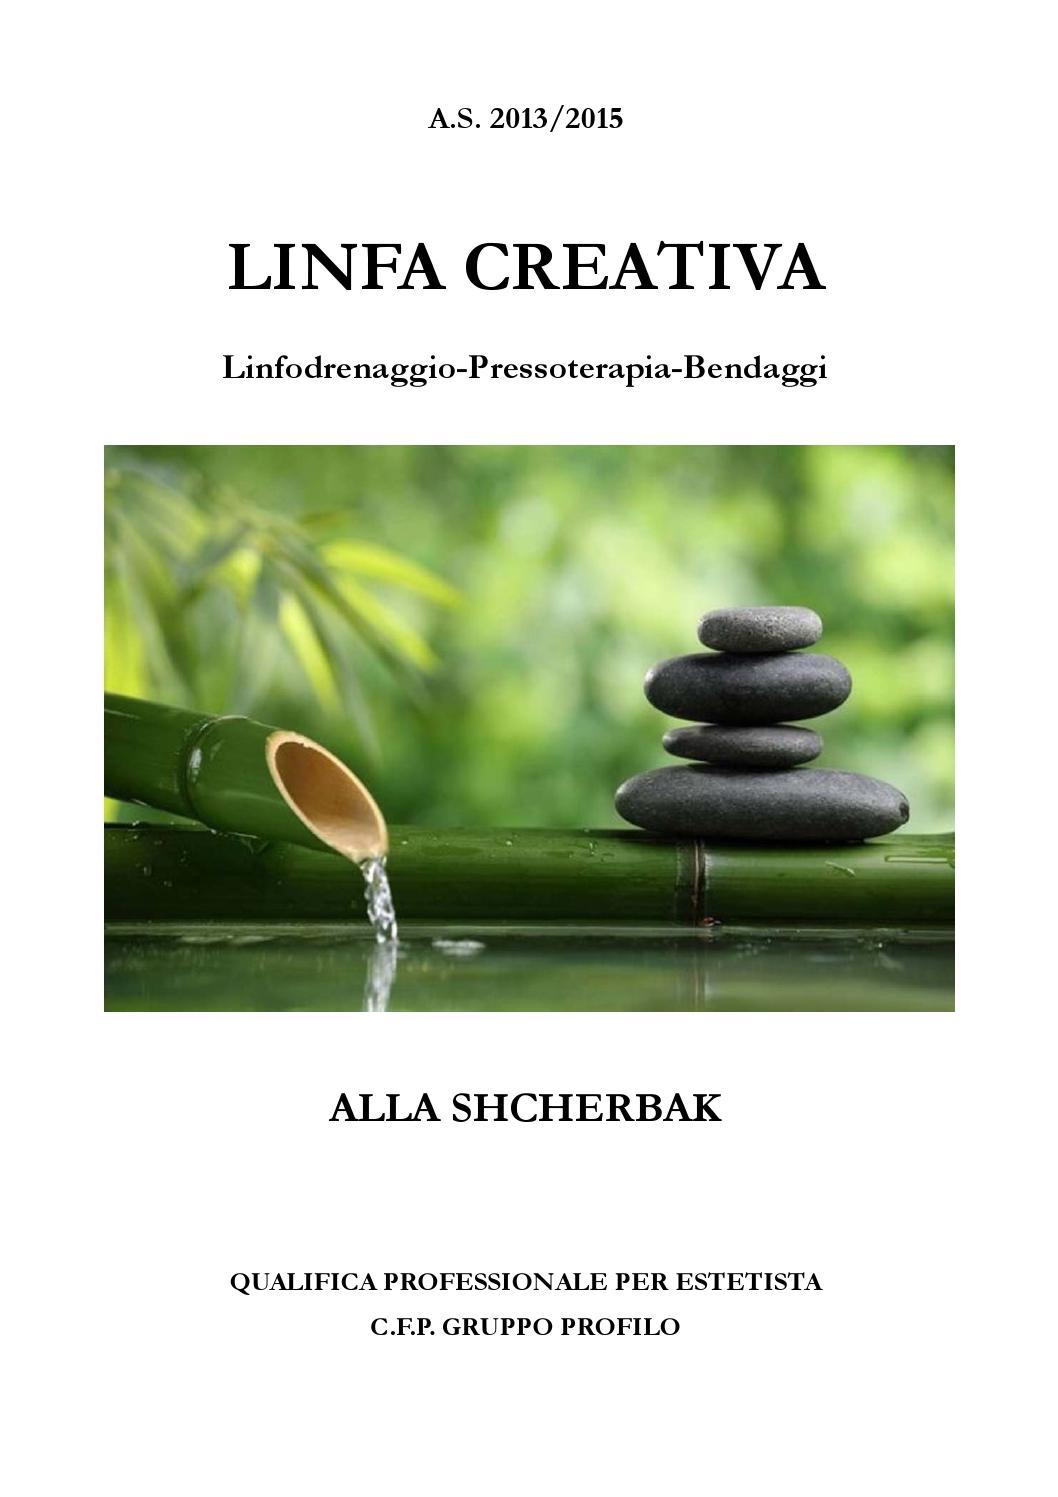 Tesina La Linfa Creativa Alla Shcherbak By Sara Profilo Issuu